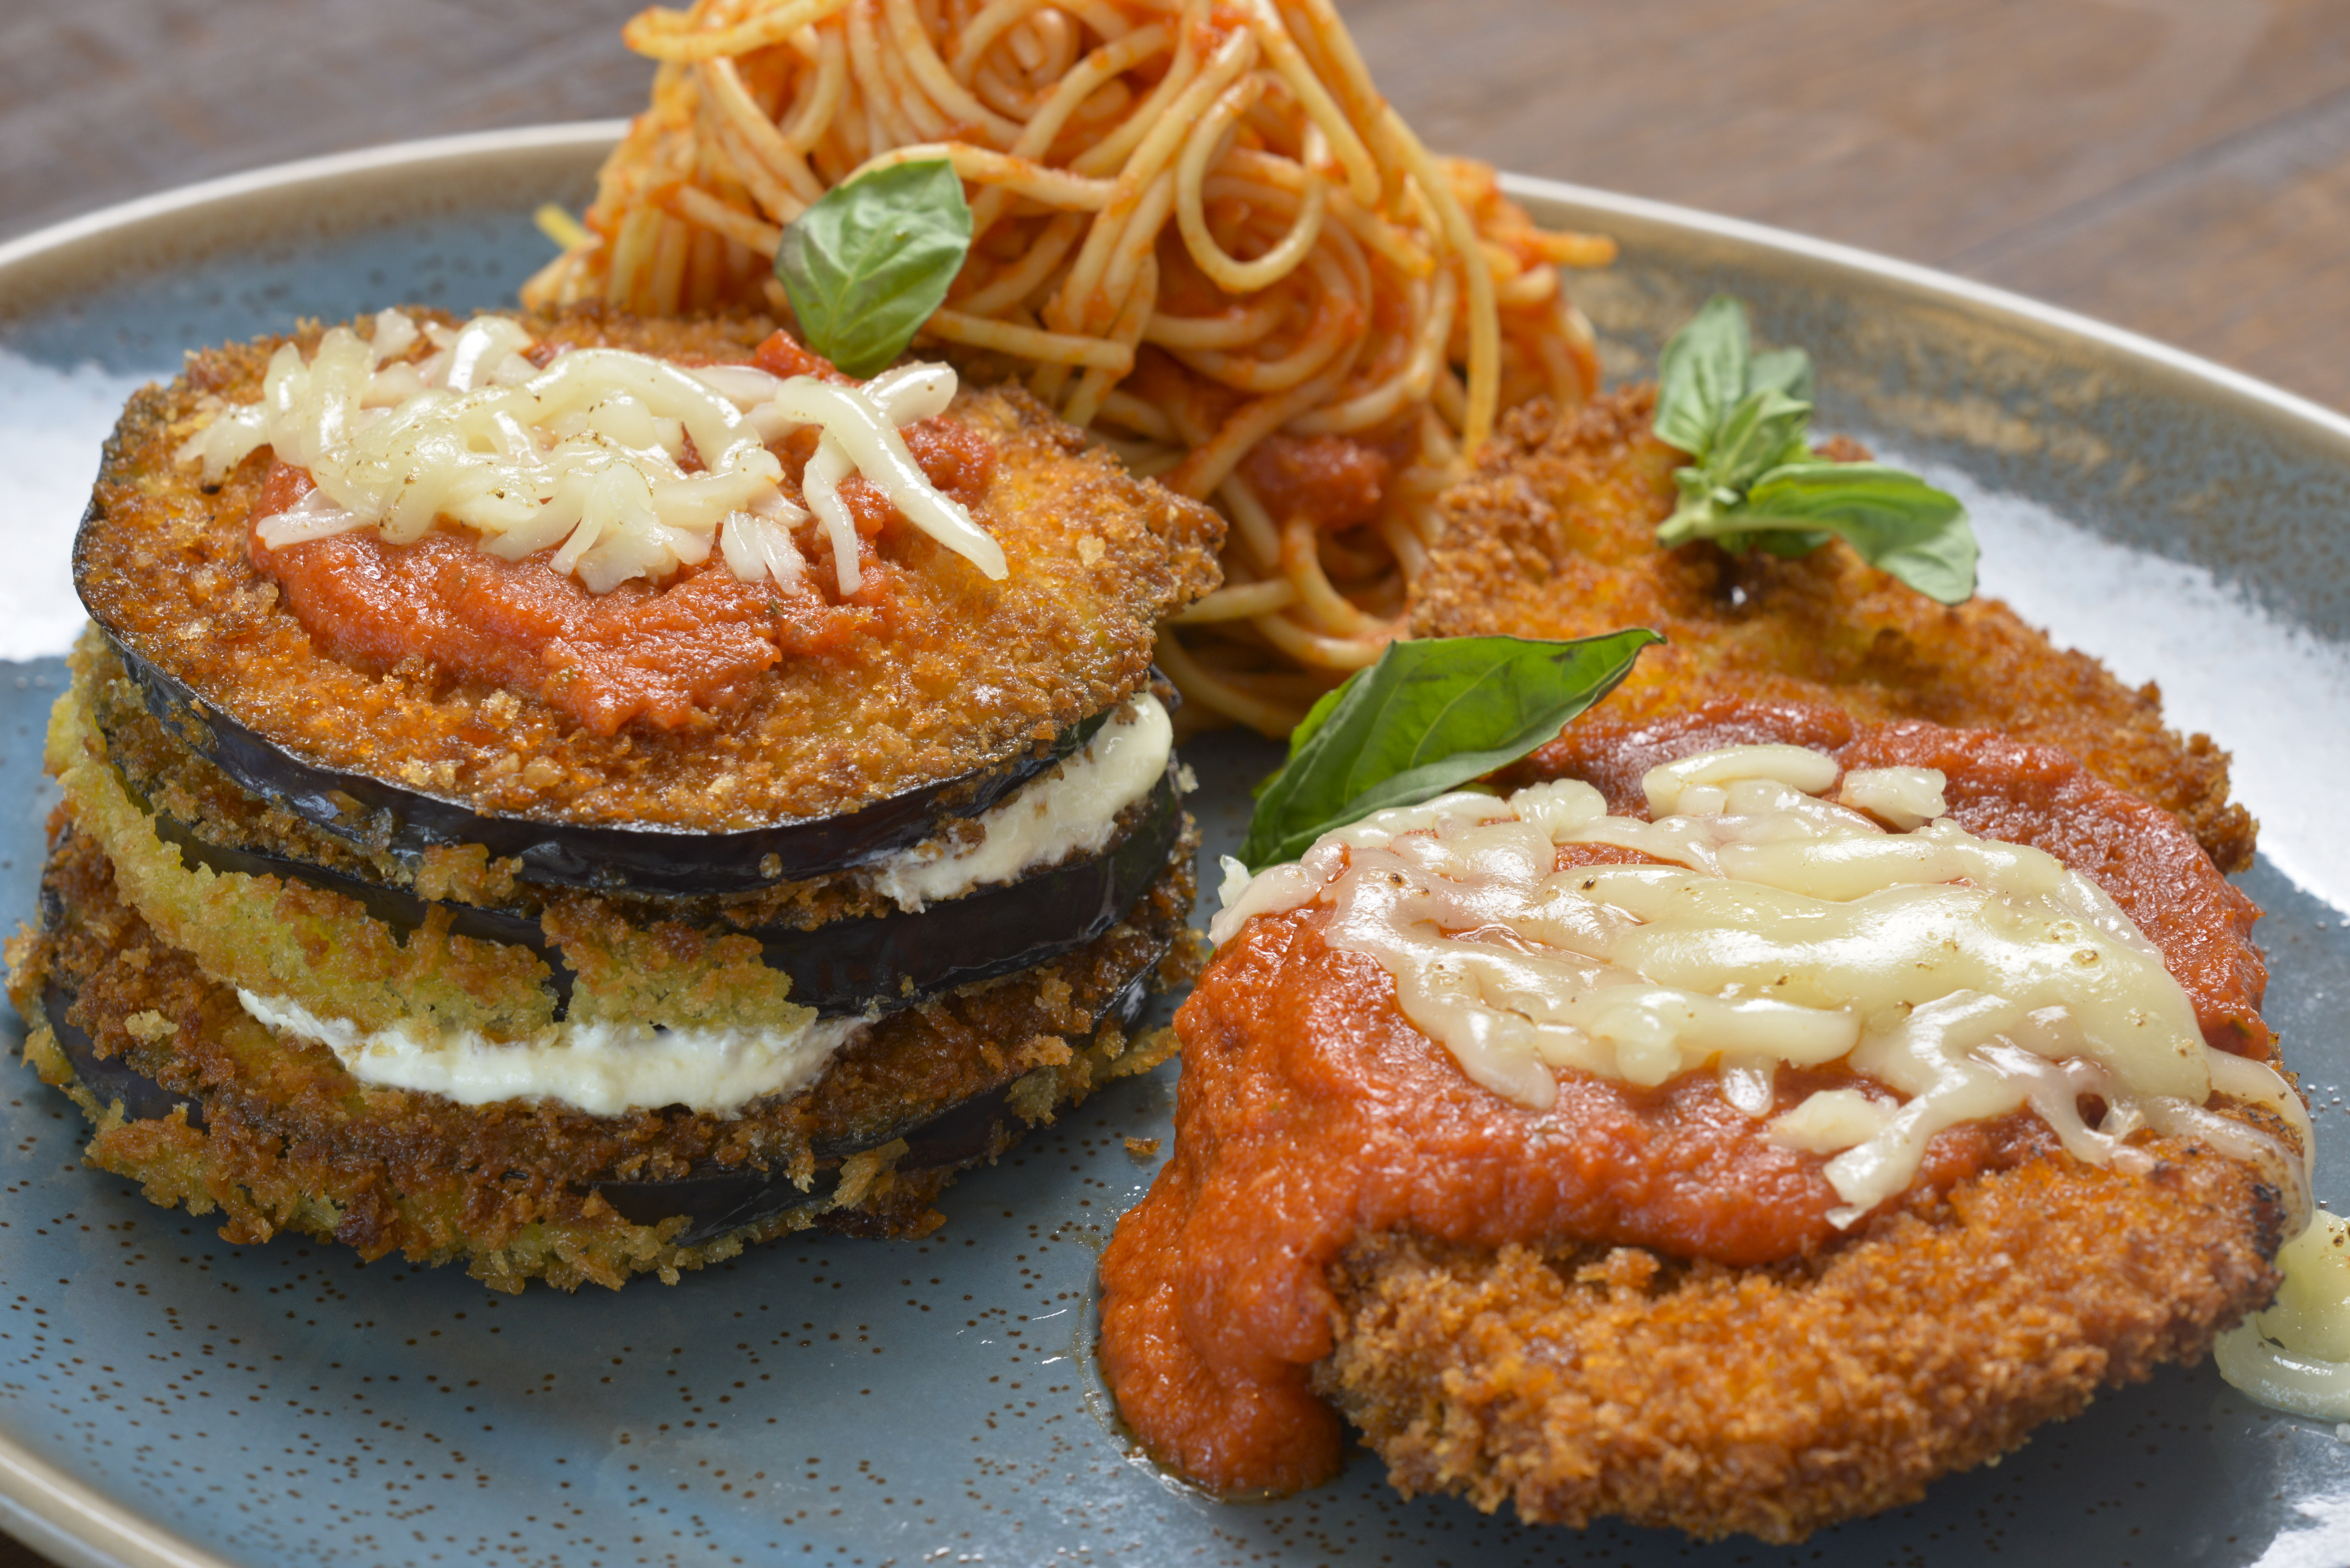 Terralina Crafted Italian - Eggplant Parmesan Stack